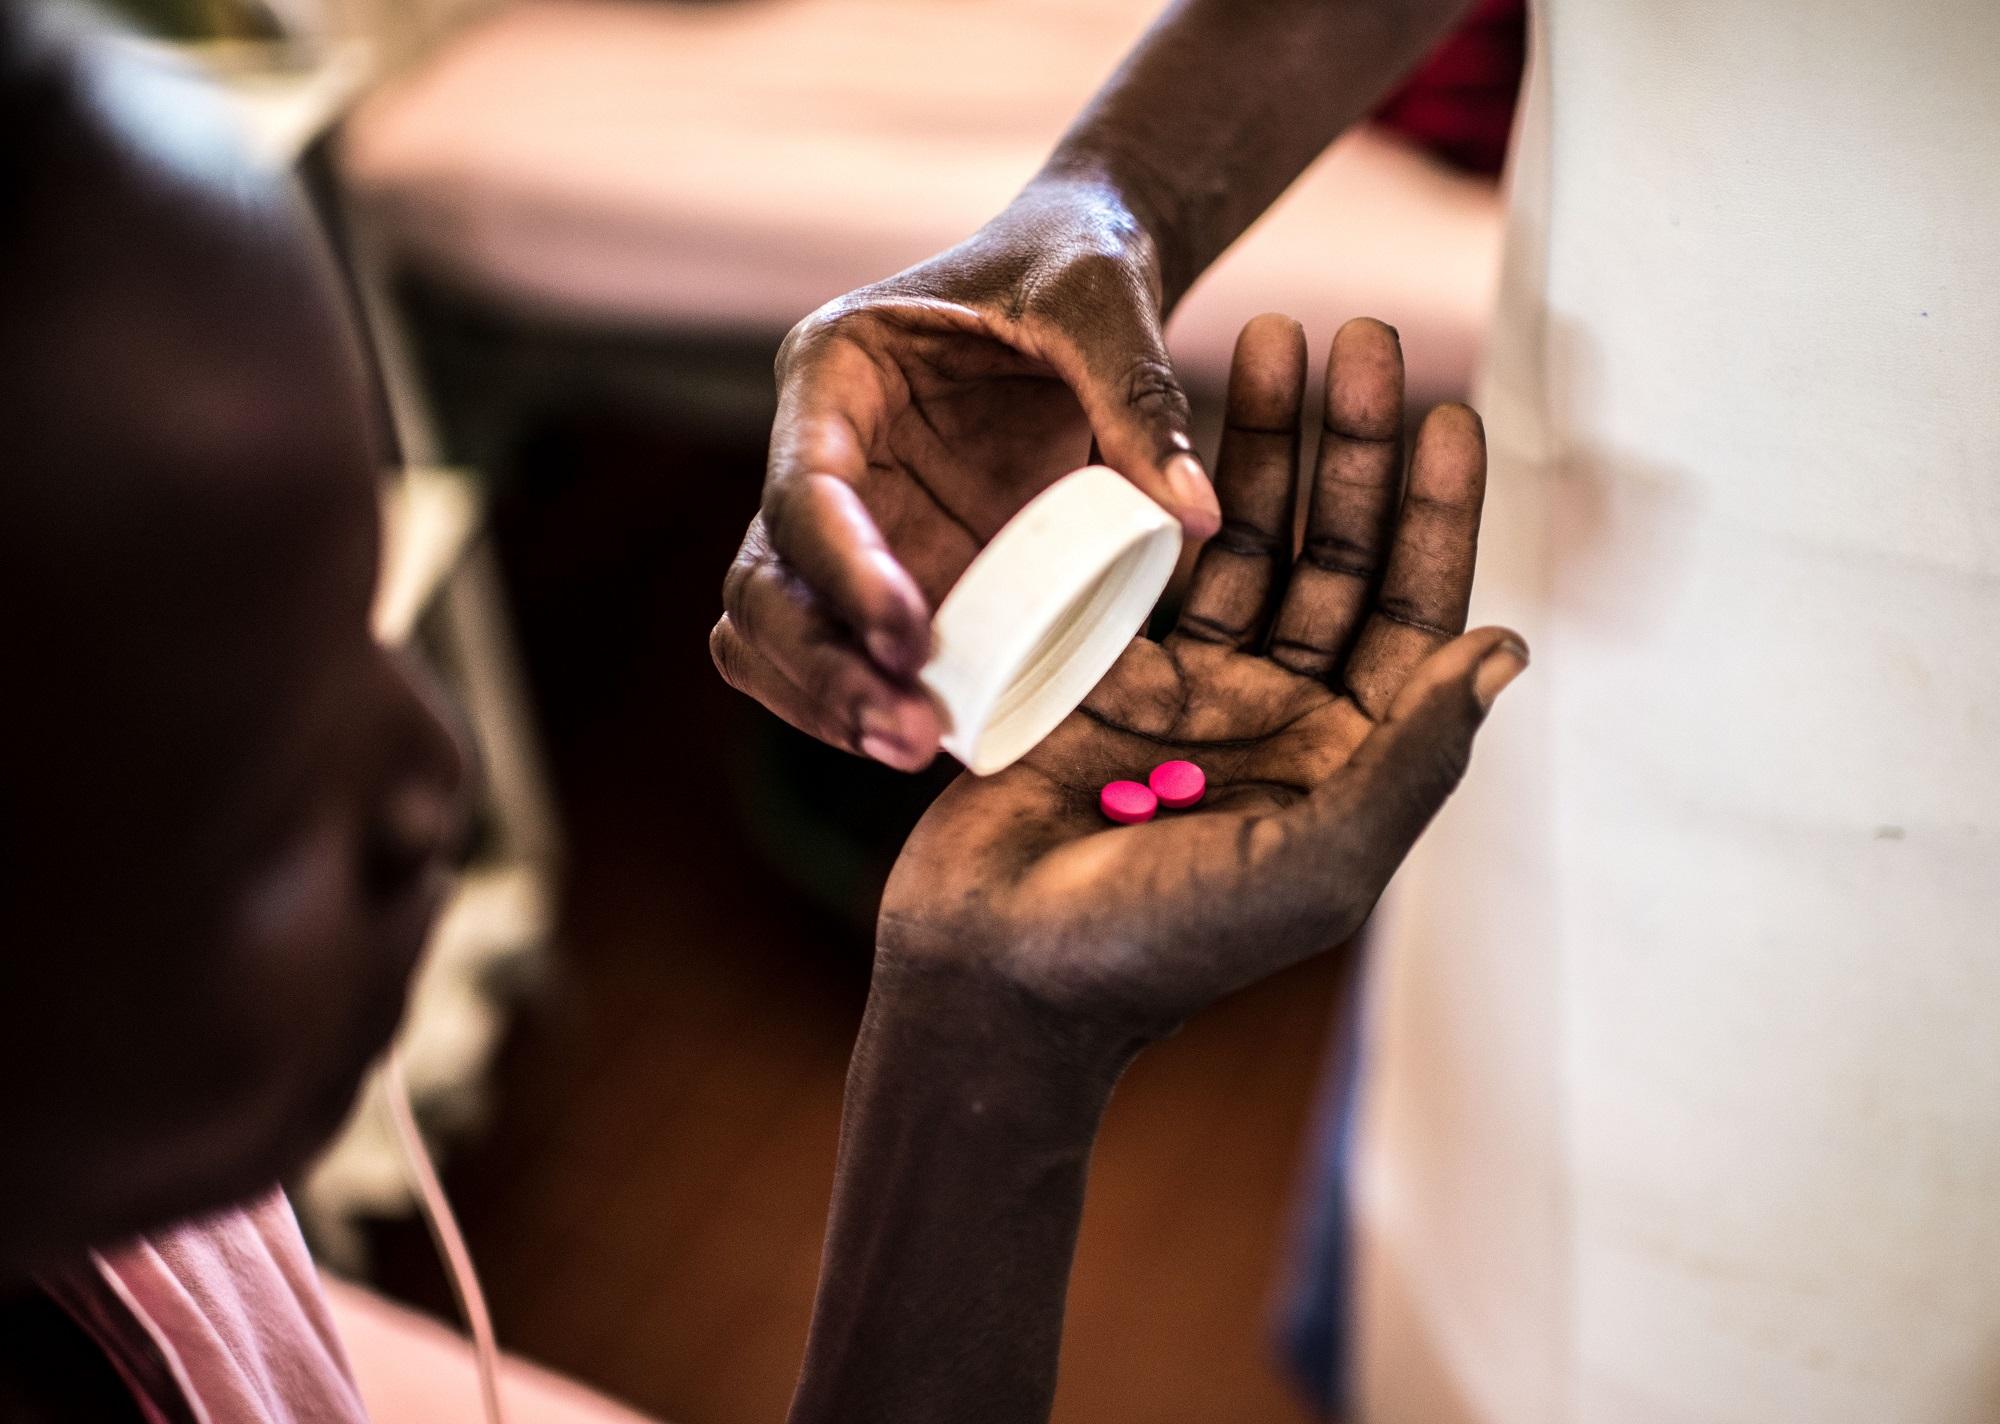 Midwife Lotukei Anna Grace dispenses a patient's medications in the maternity ward of the Matany hospital in Karamoja, Uganda.